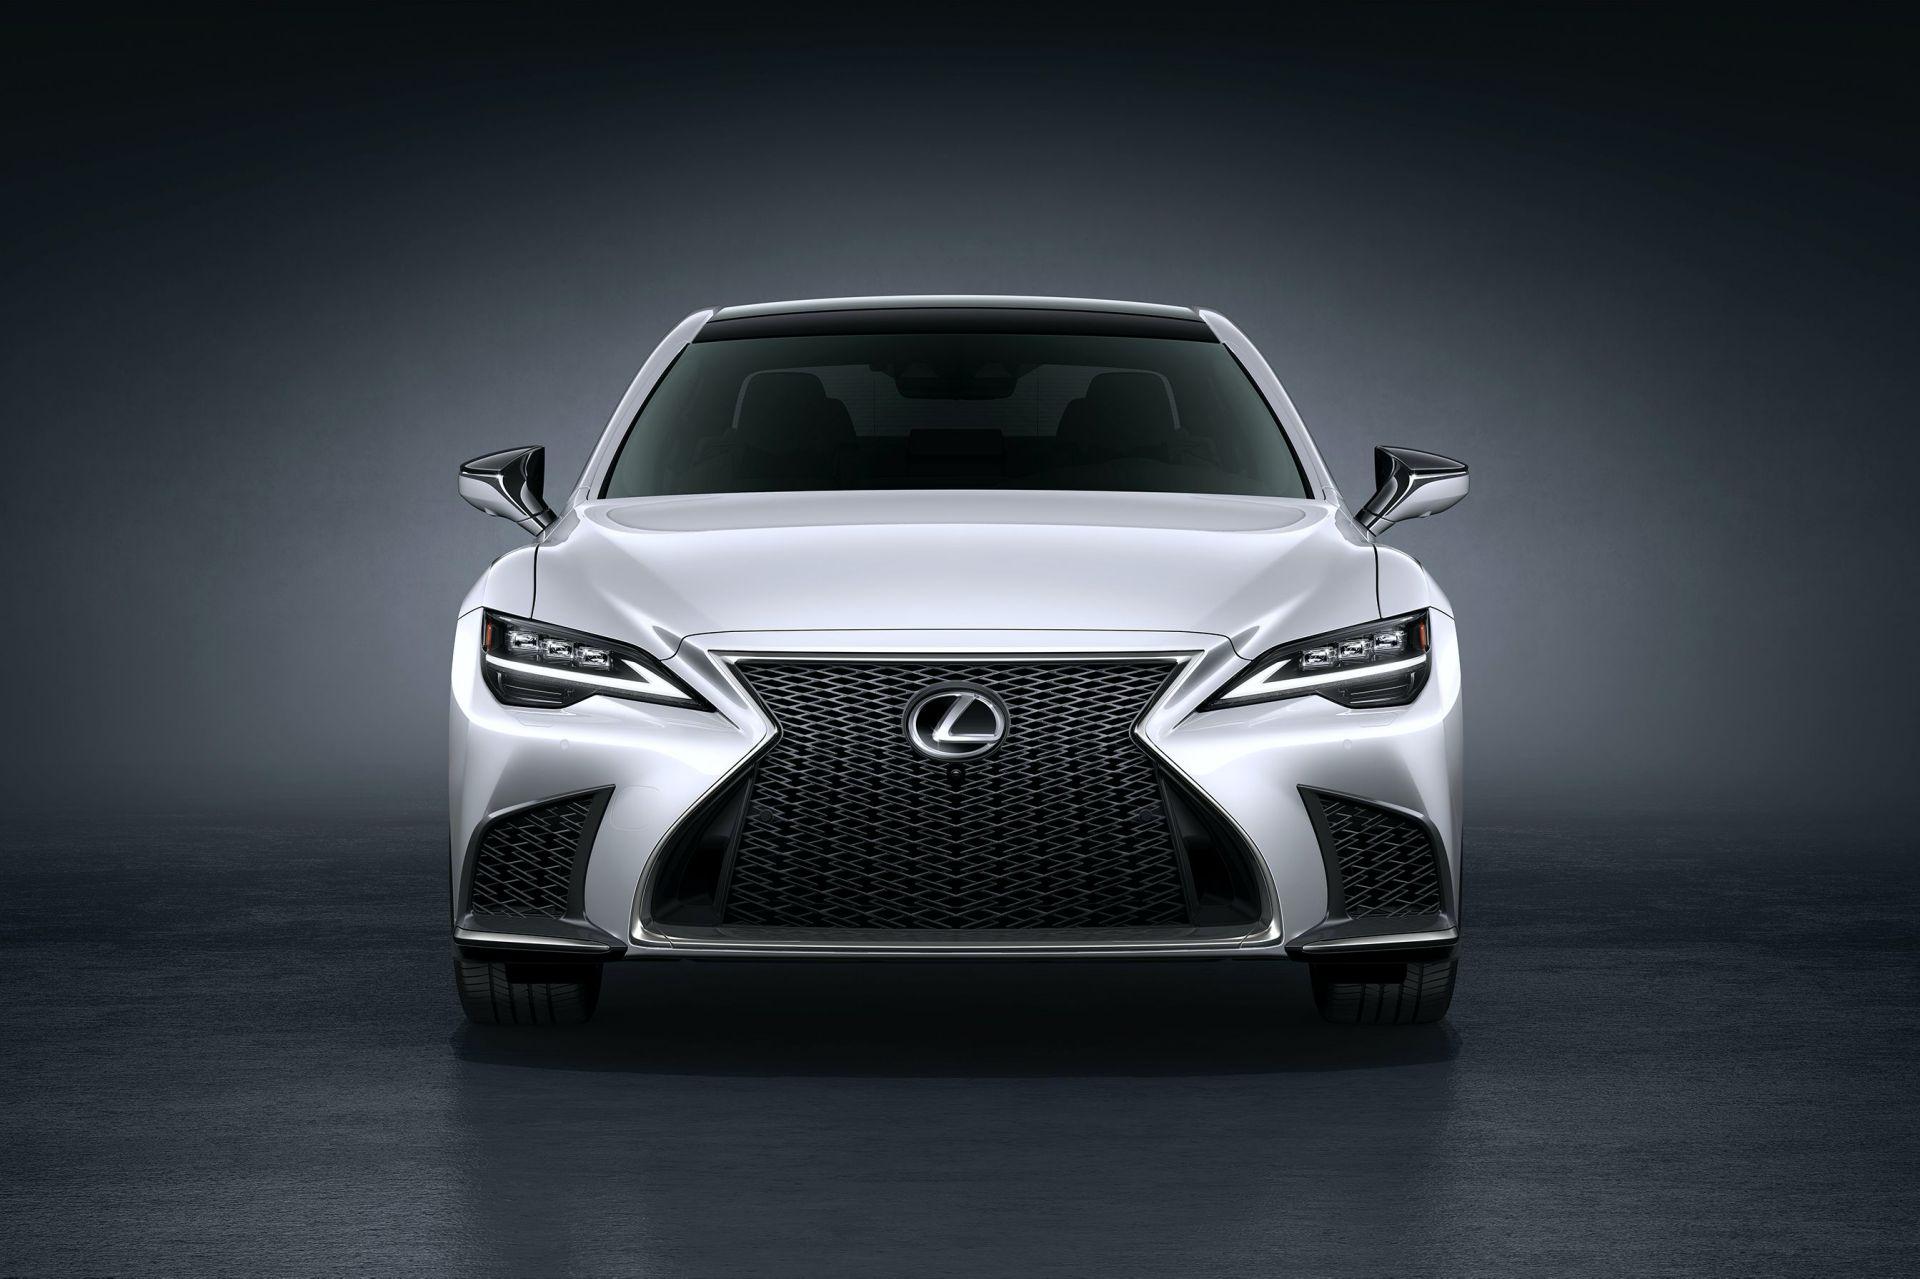 2021-lexus-ls-facelift-2.jpg